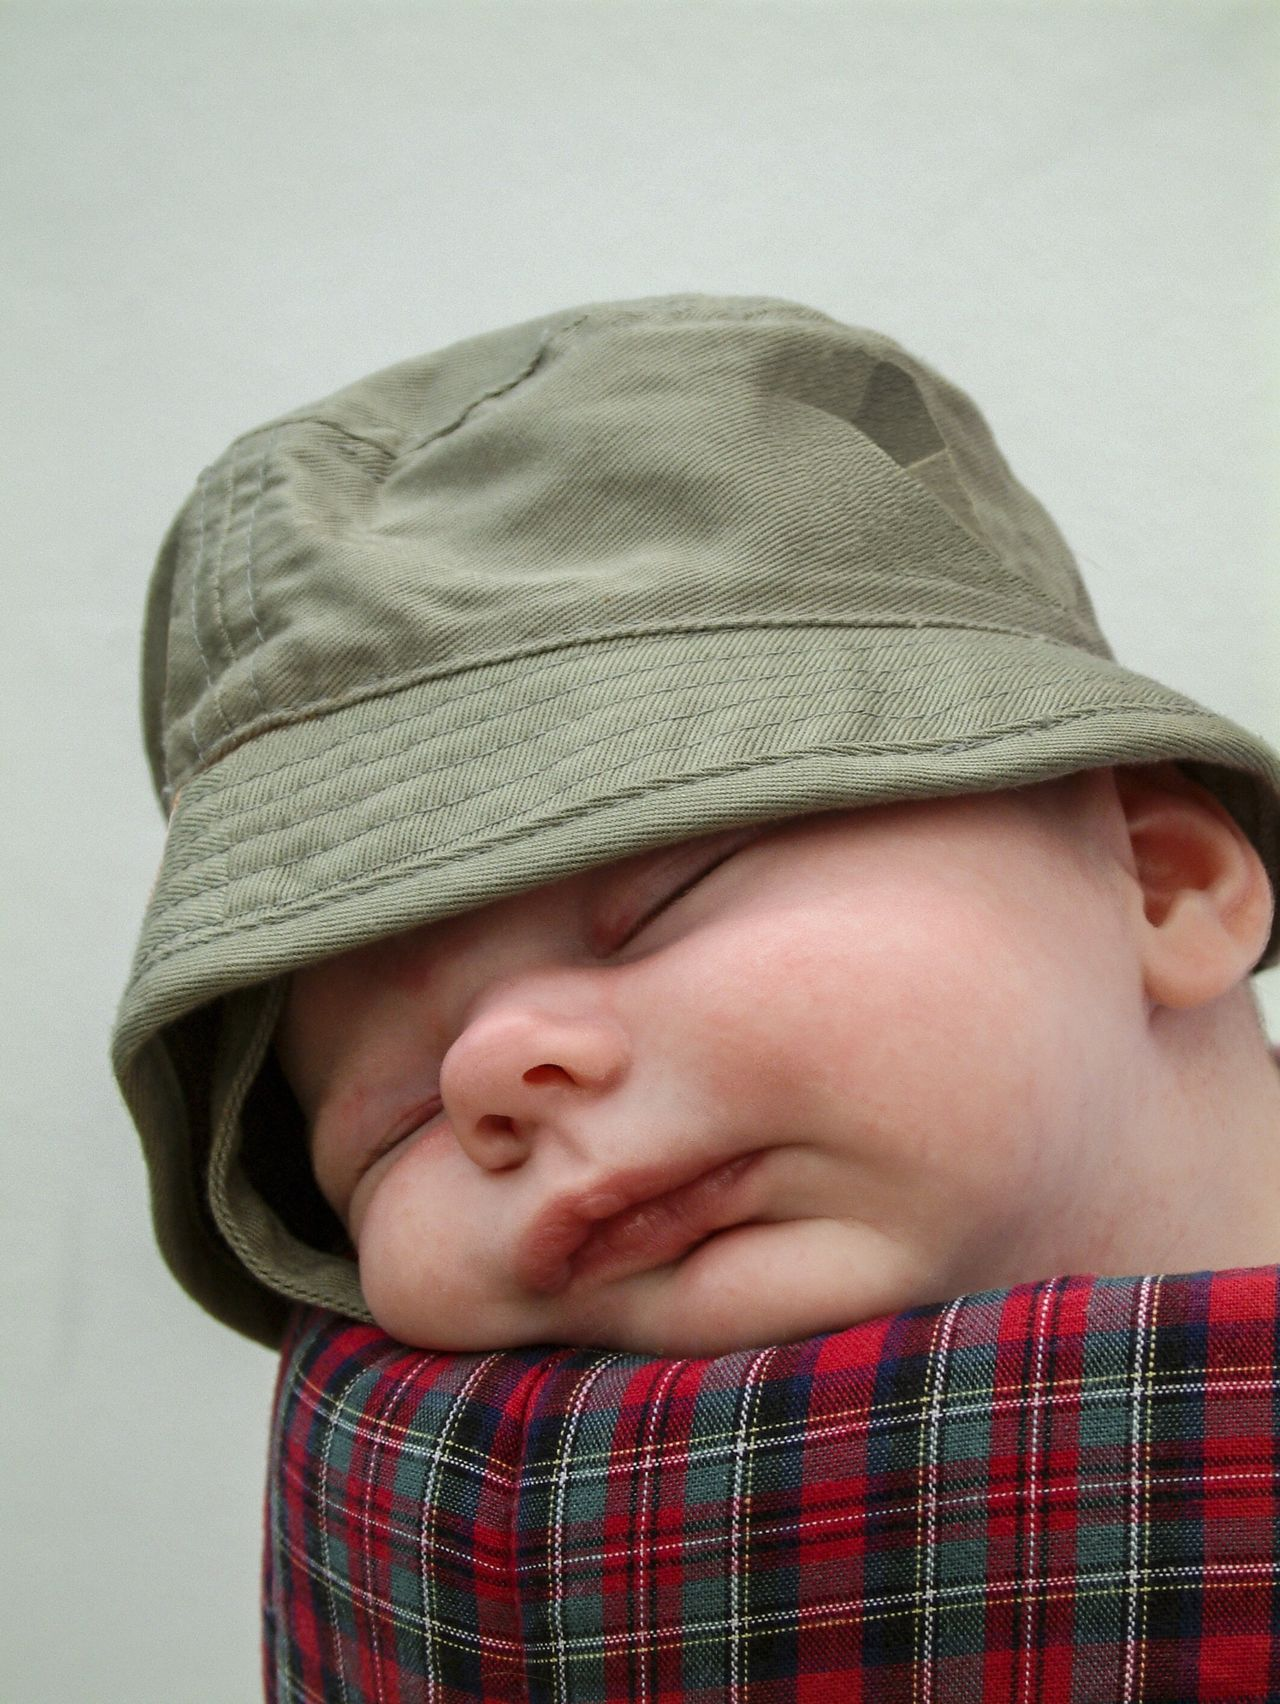 Sleeping Baby  Cute Peaceful Happy